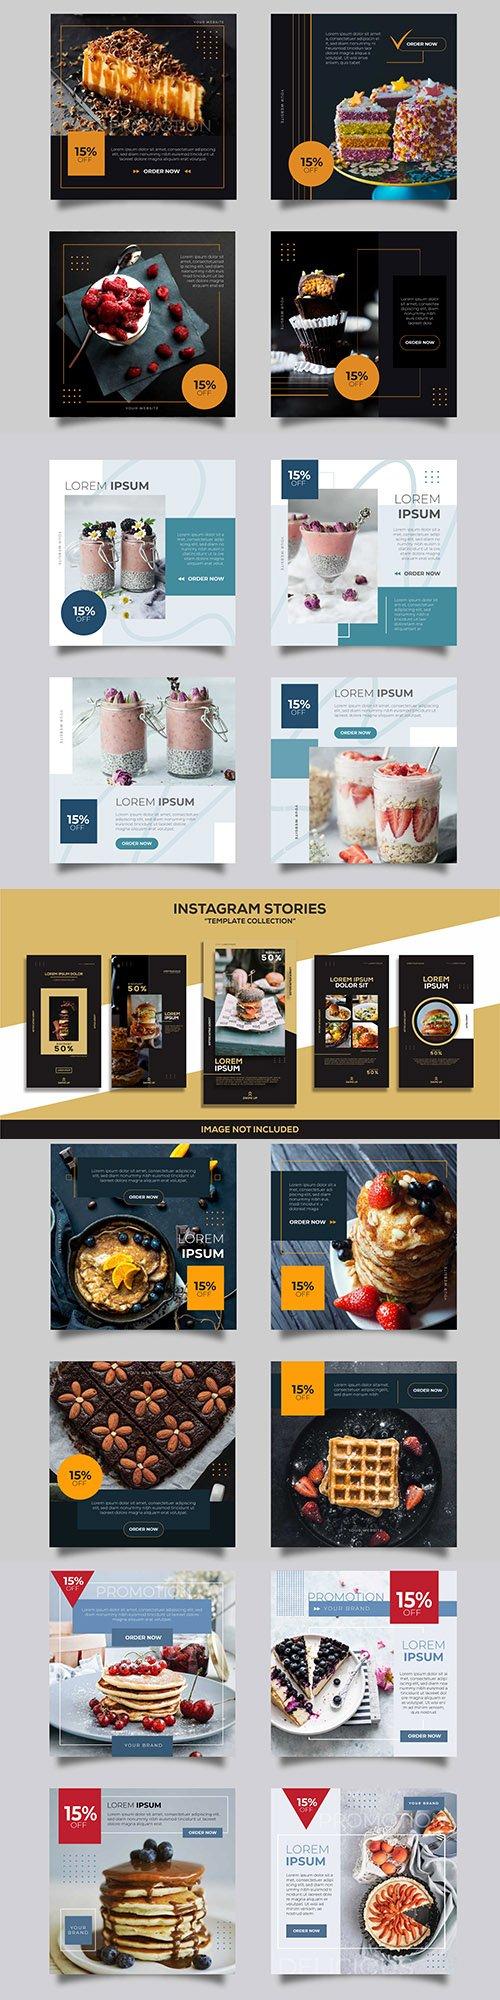 Social media instagram post design templates 3